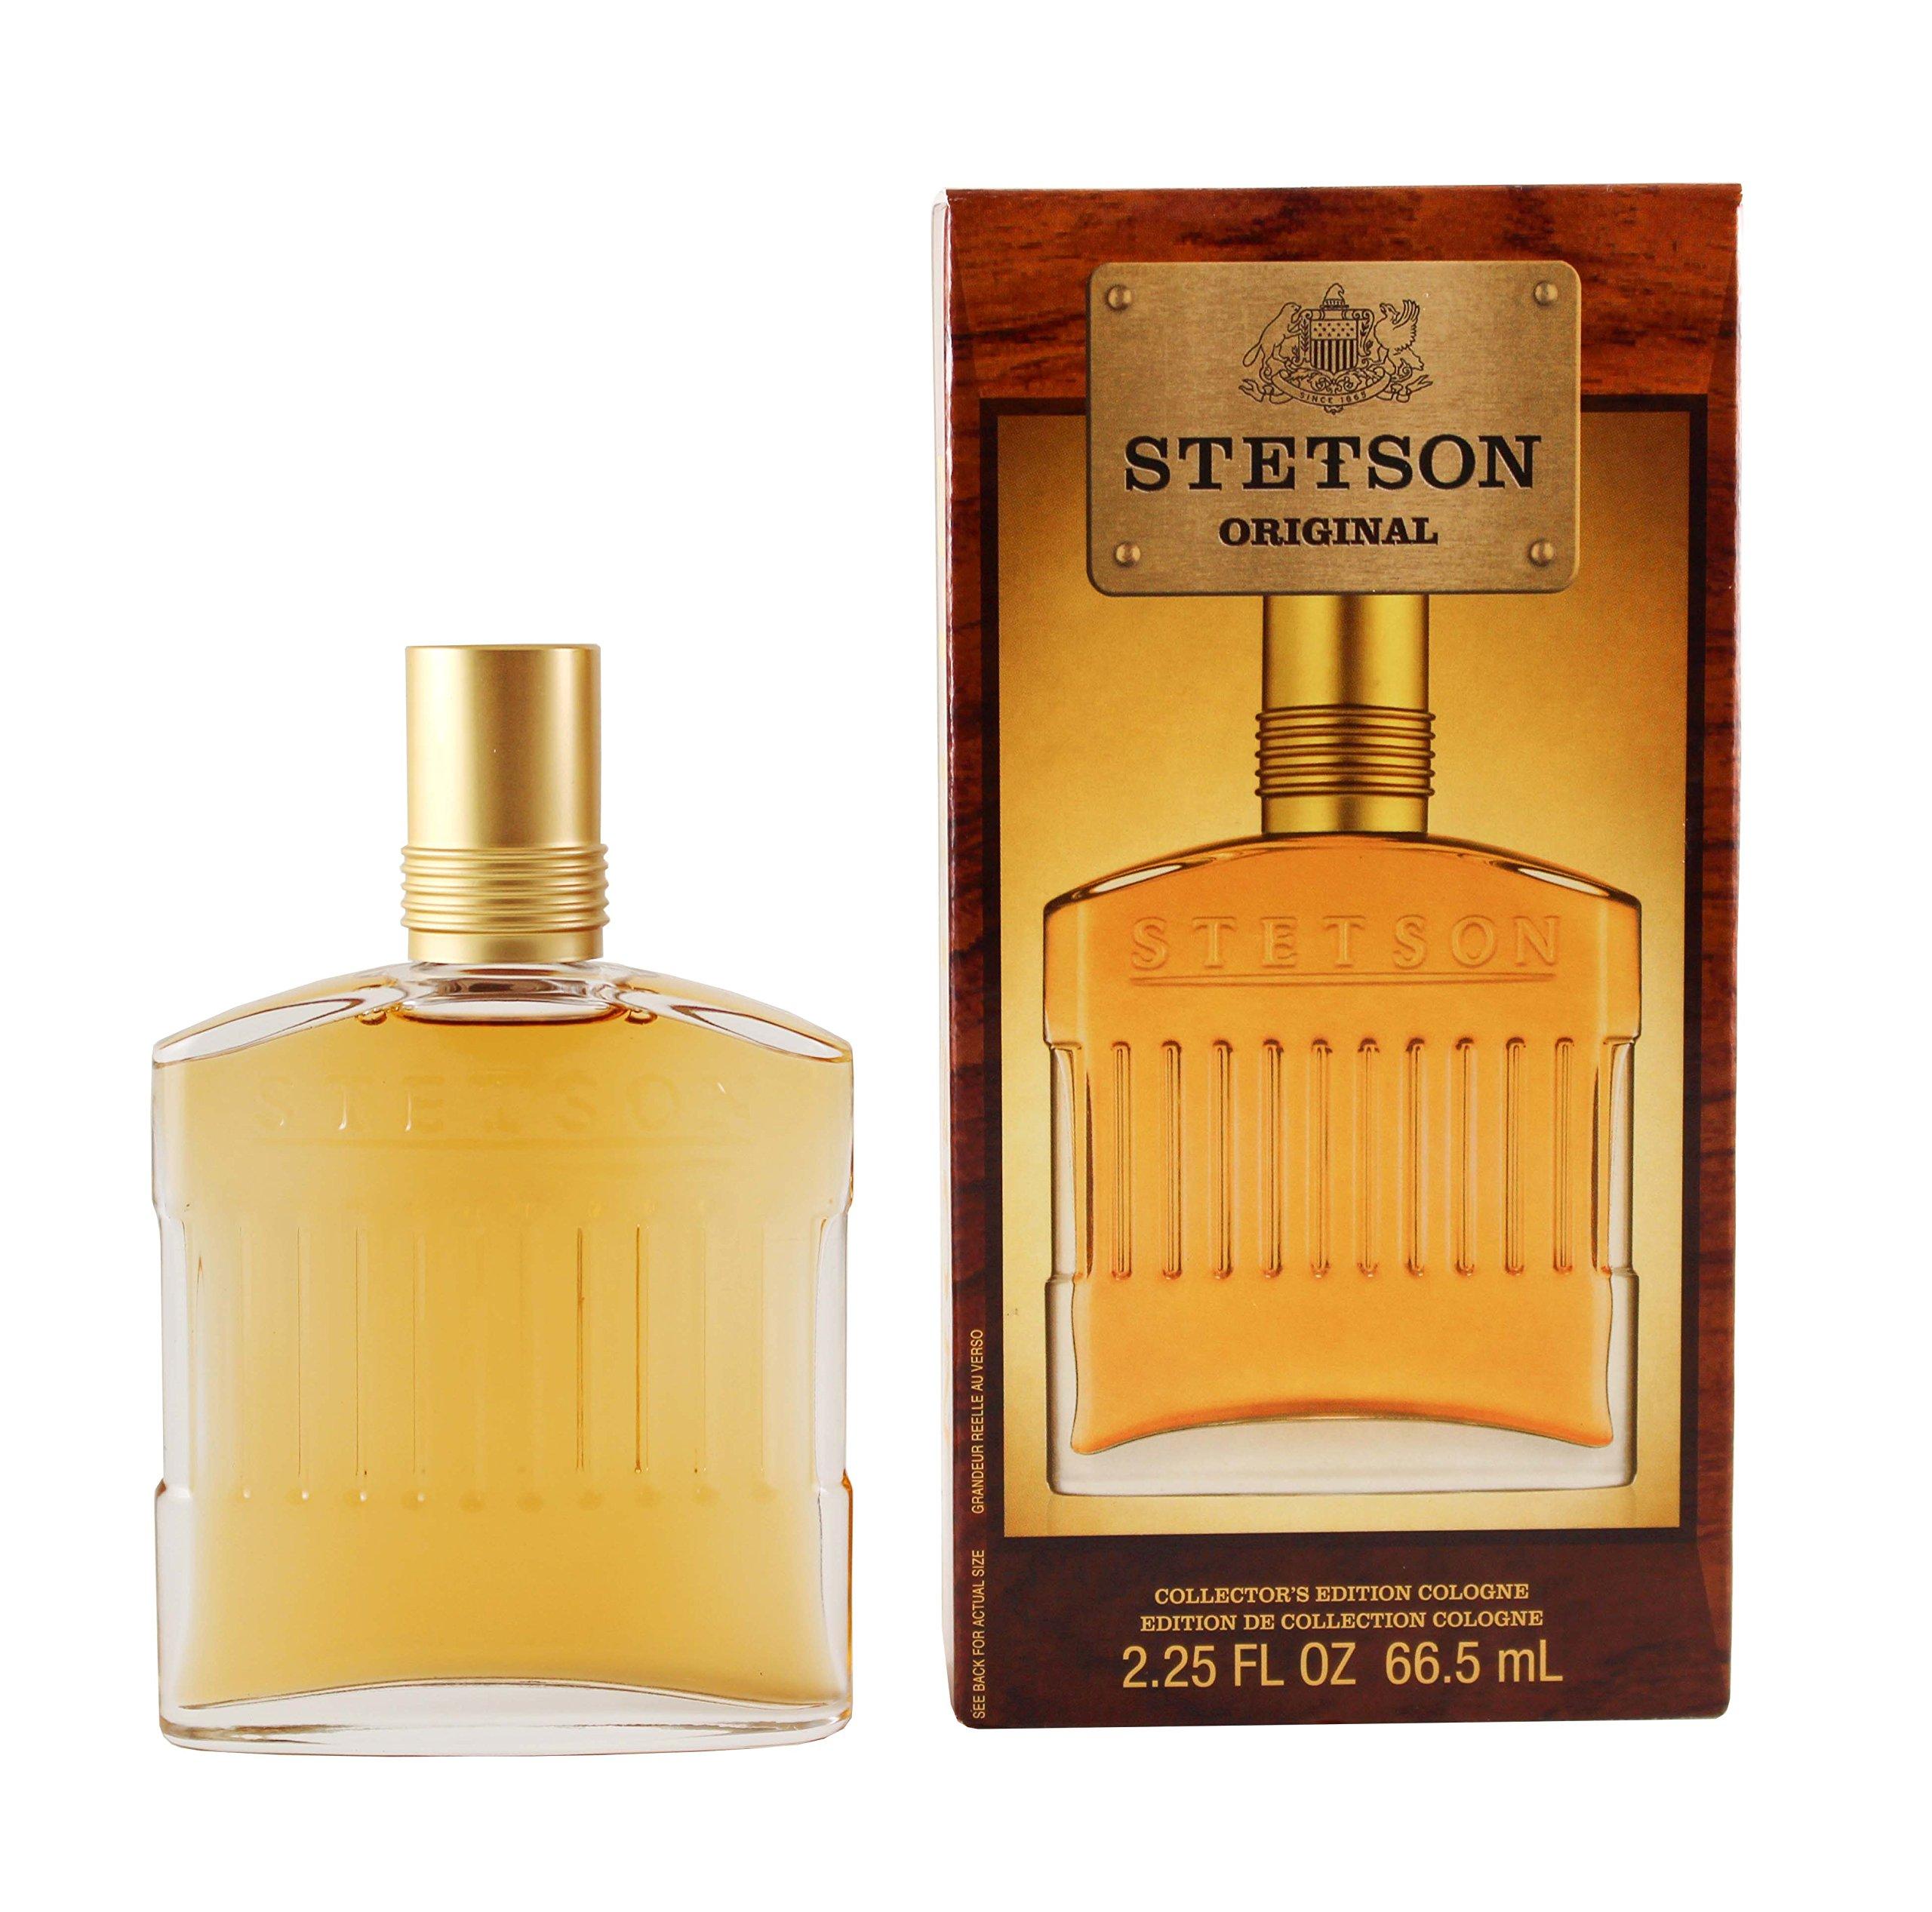 Stetson Original - 2.25oz Cologne Perfume Decanter by Stetson